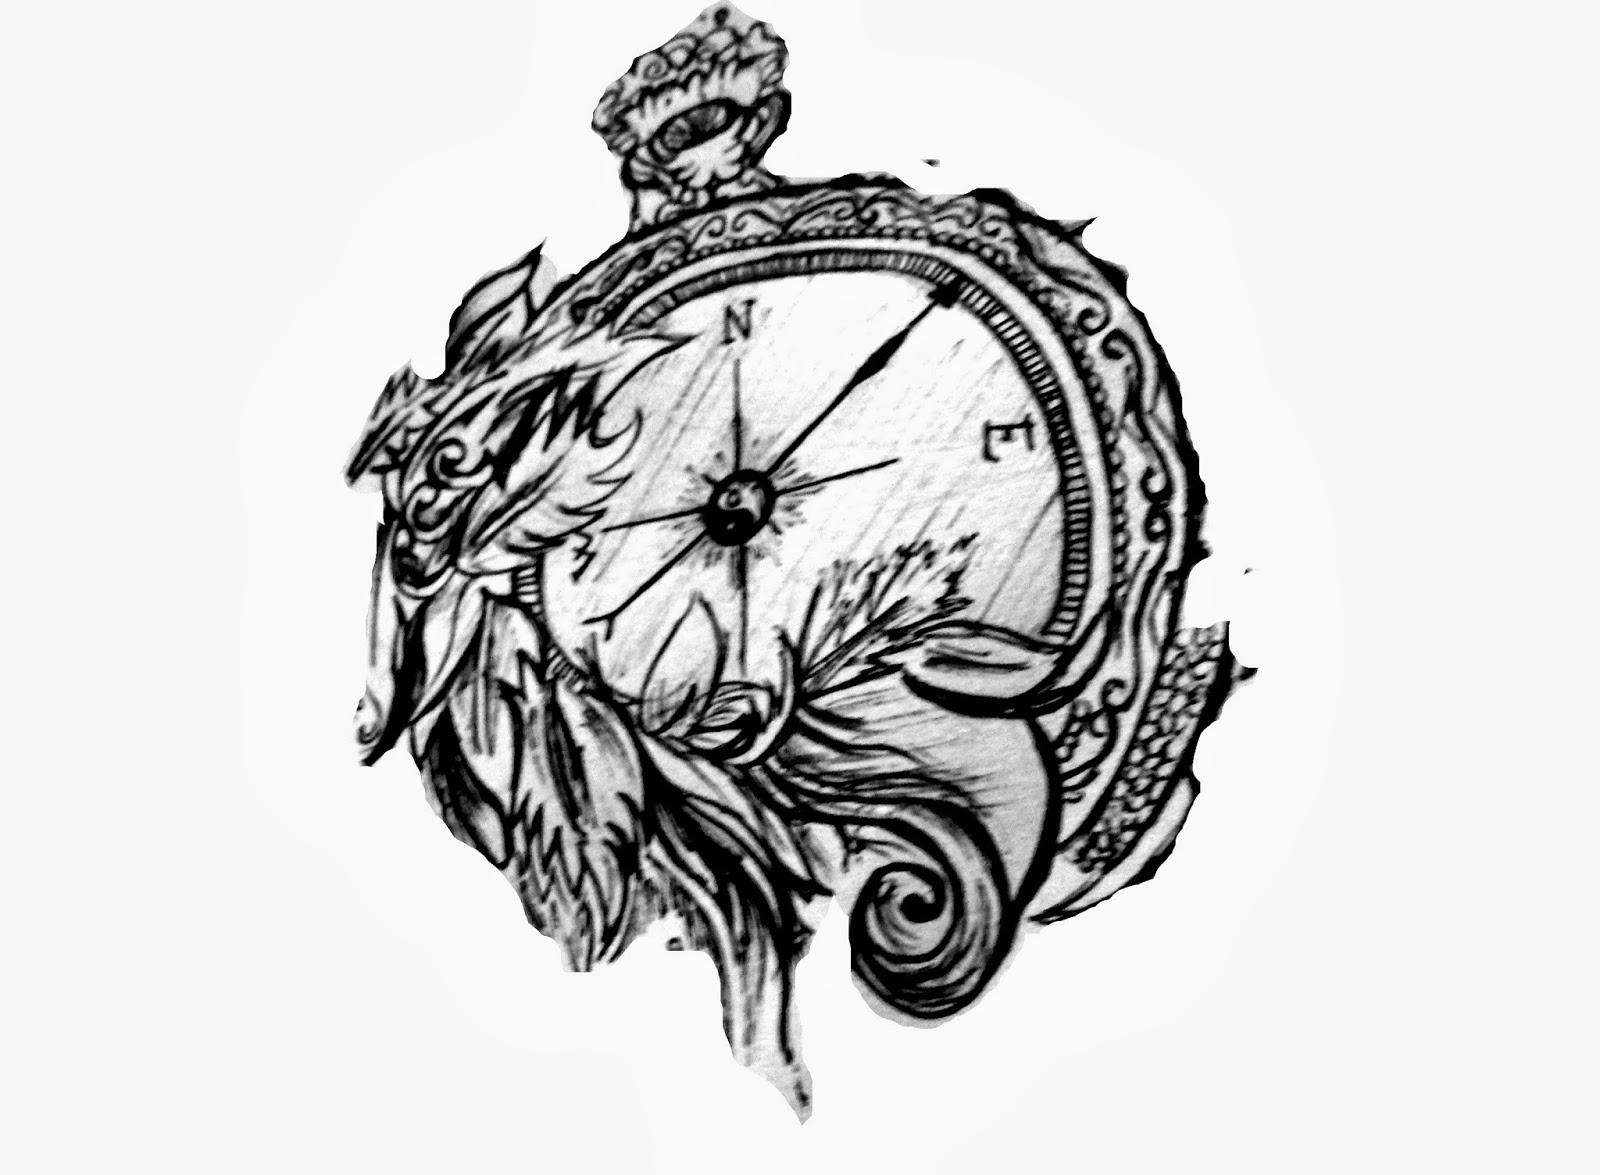 Dibujos y diseos de tatuajes Just drive